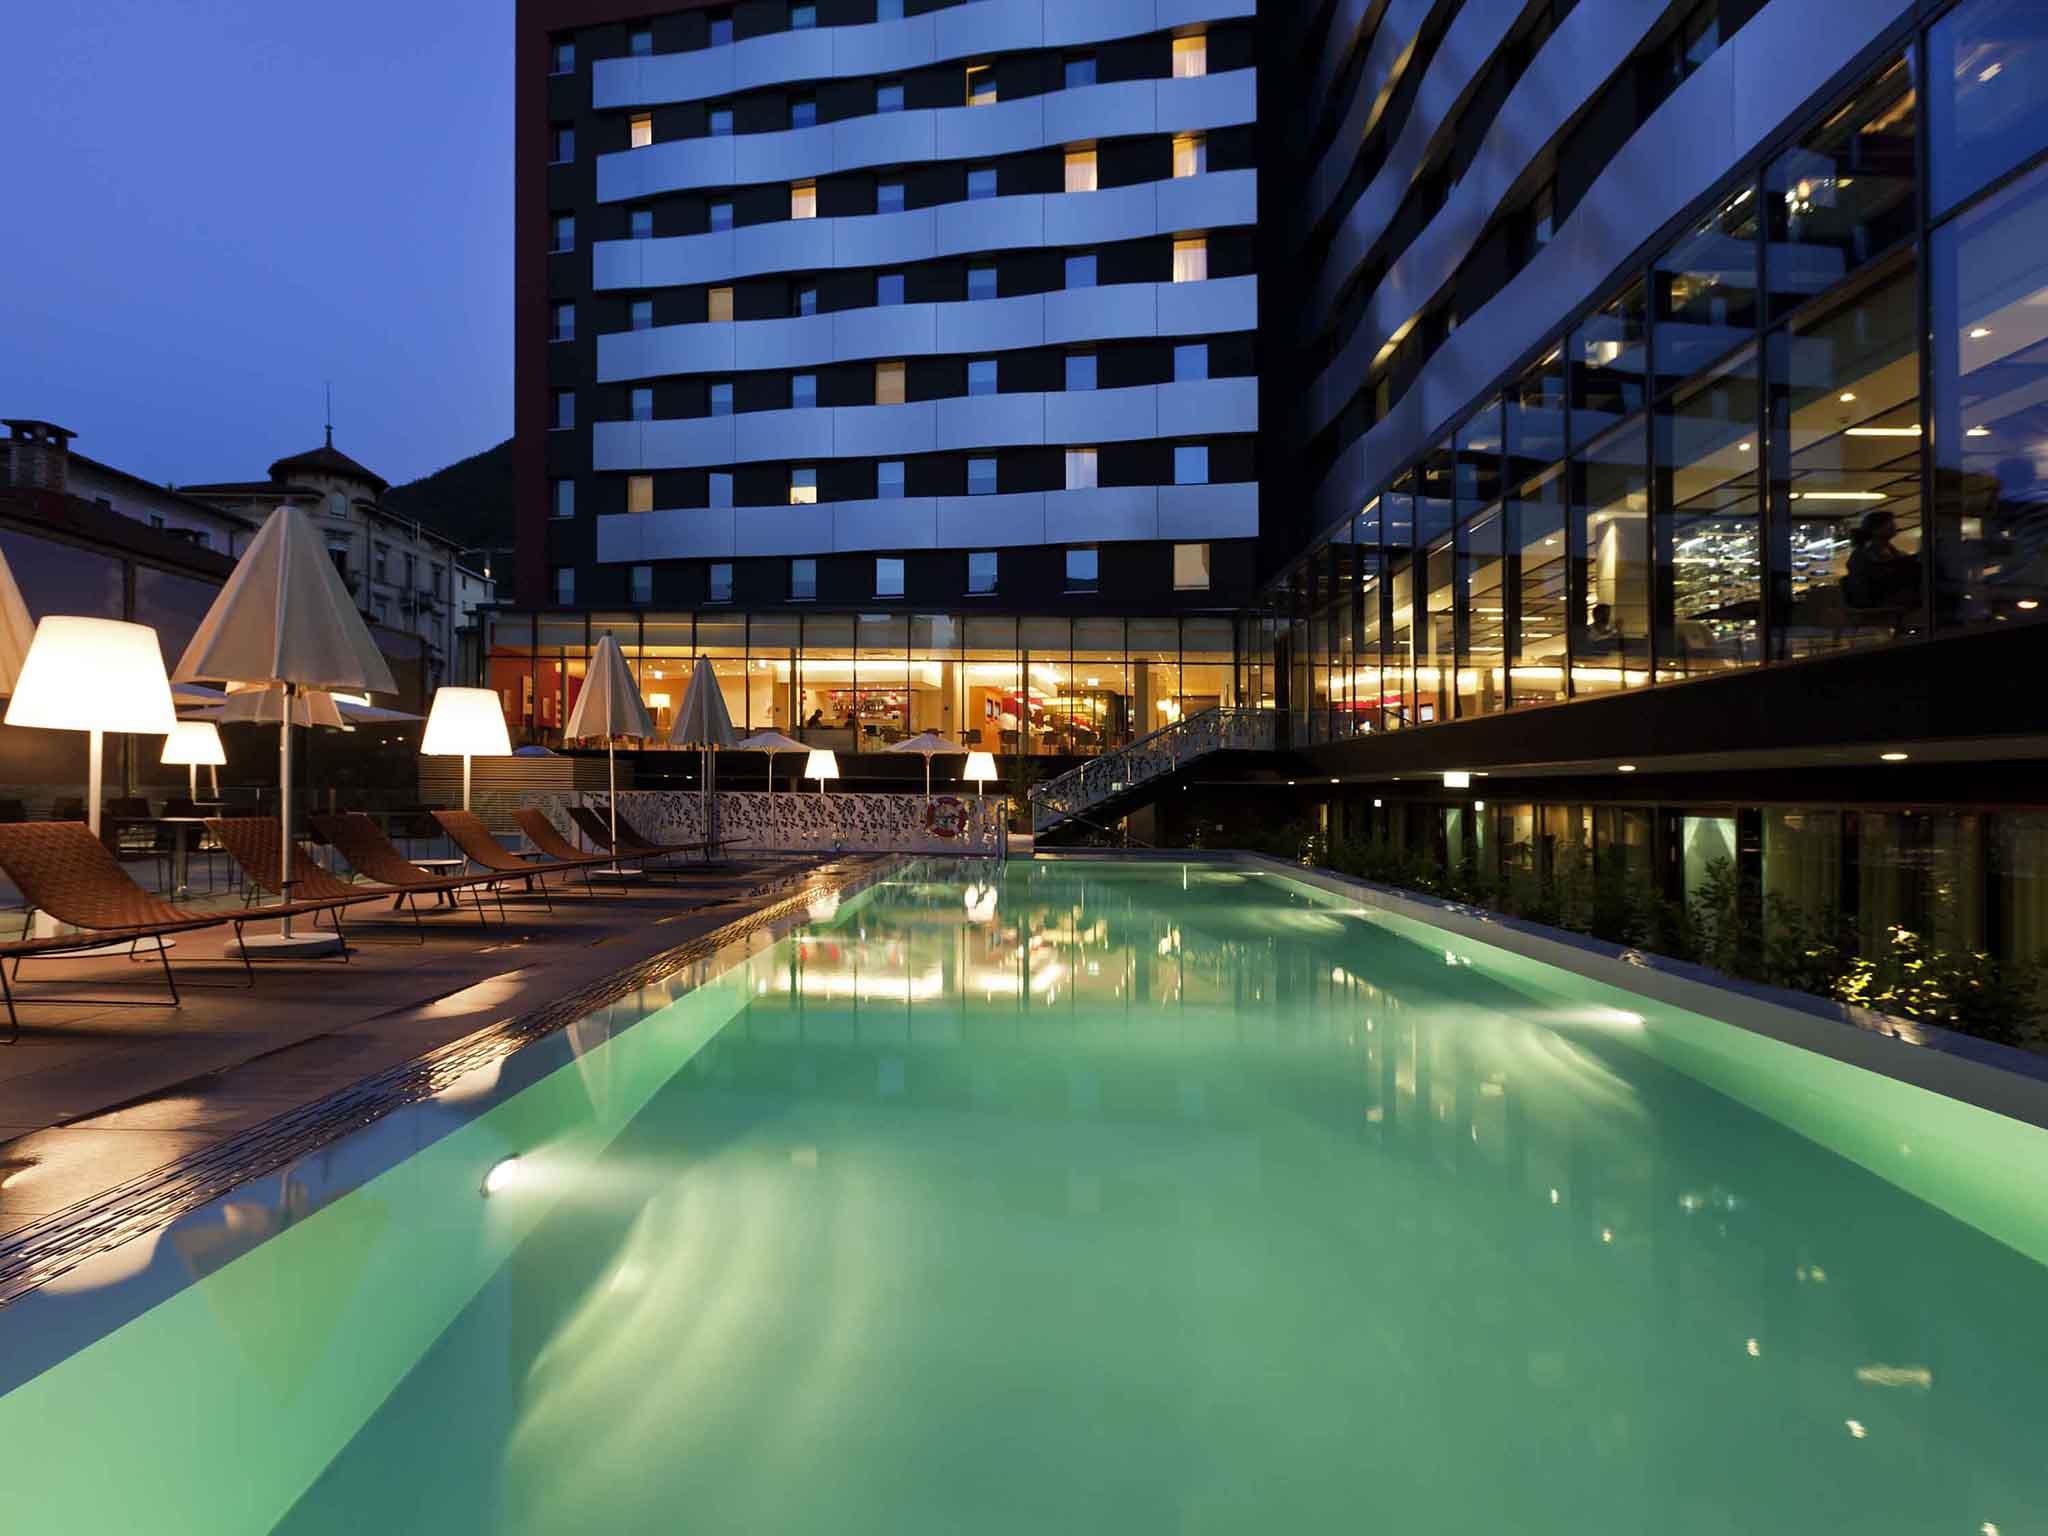 Hotell – Novotel Lugano Paradiso